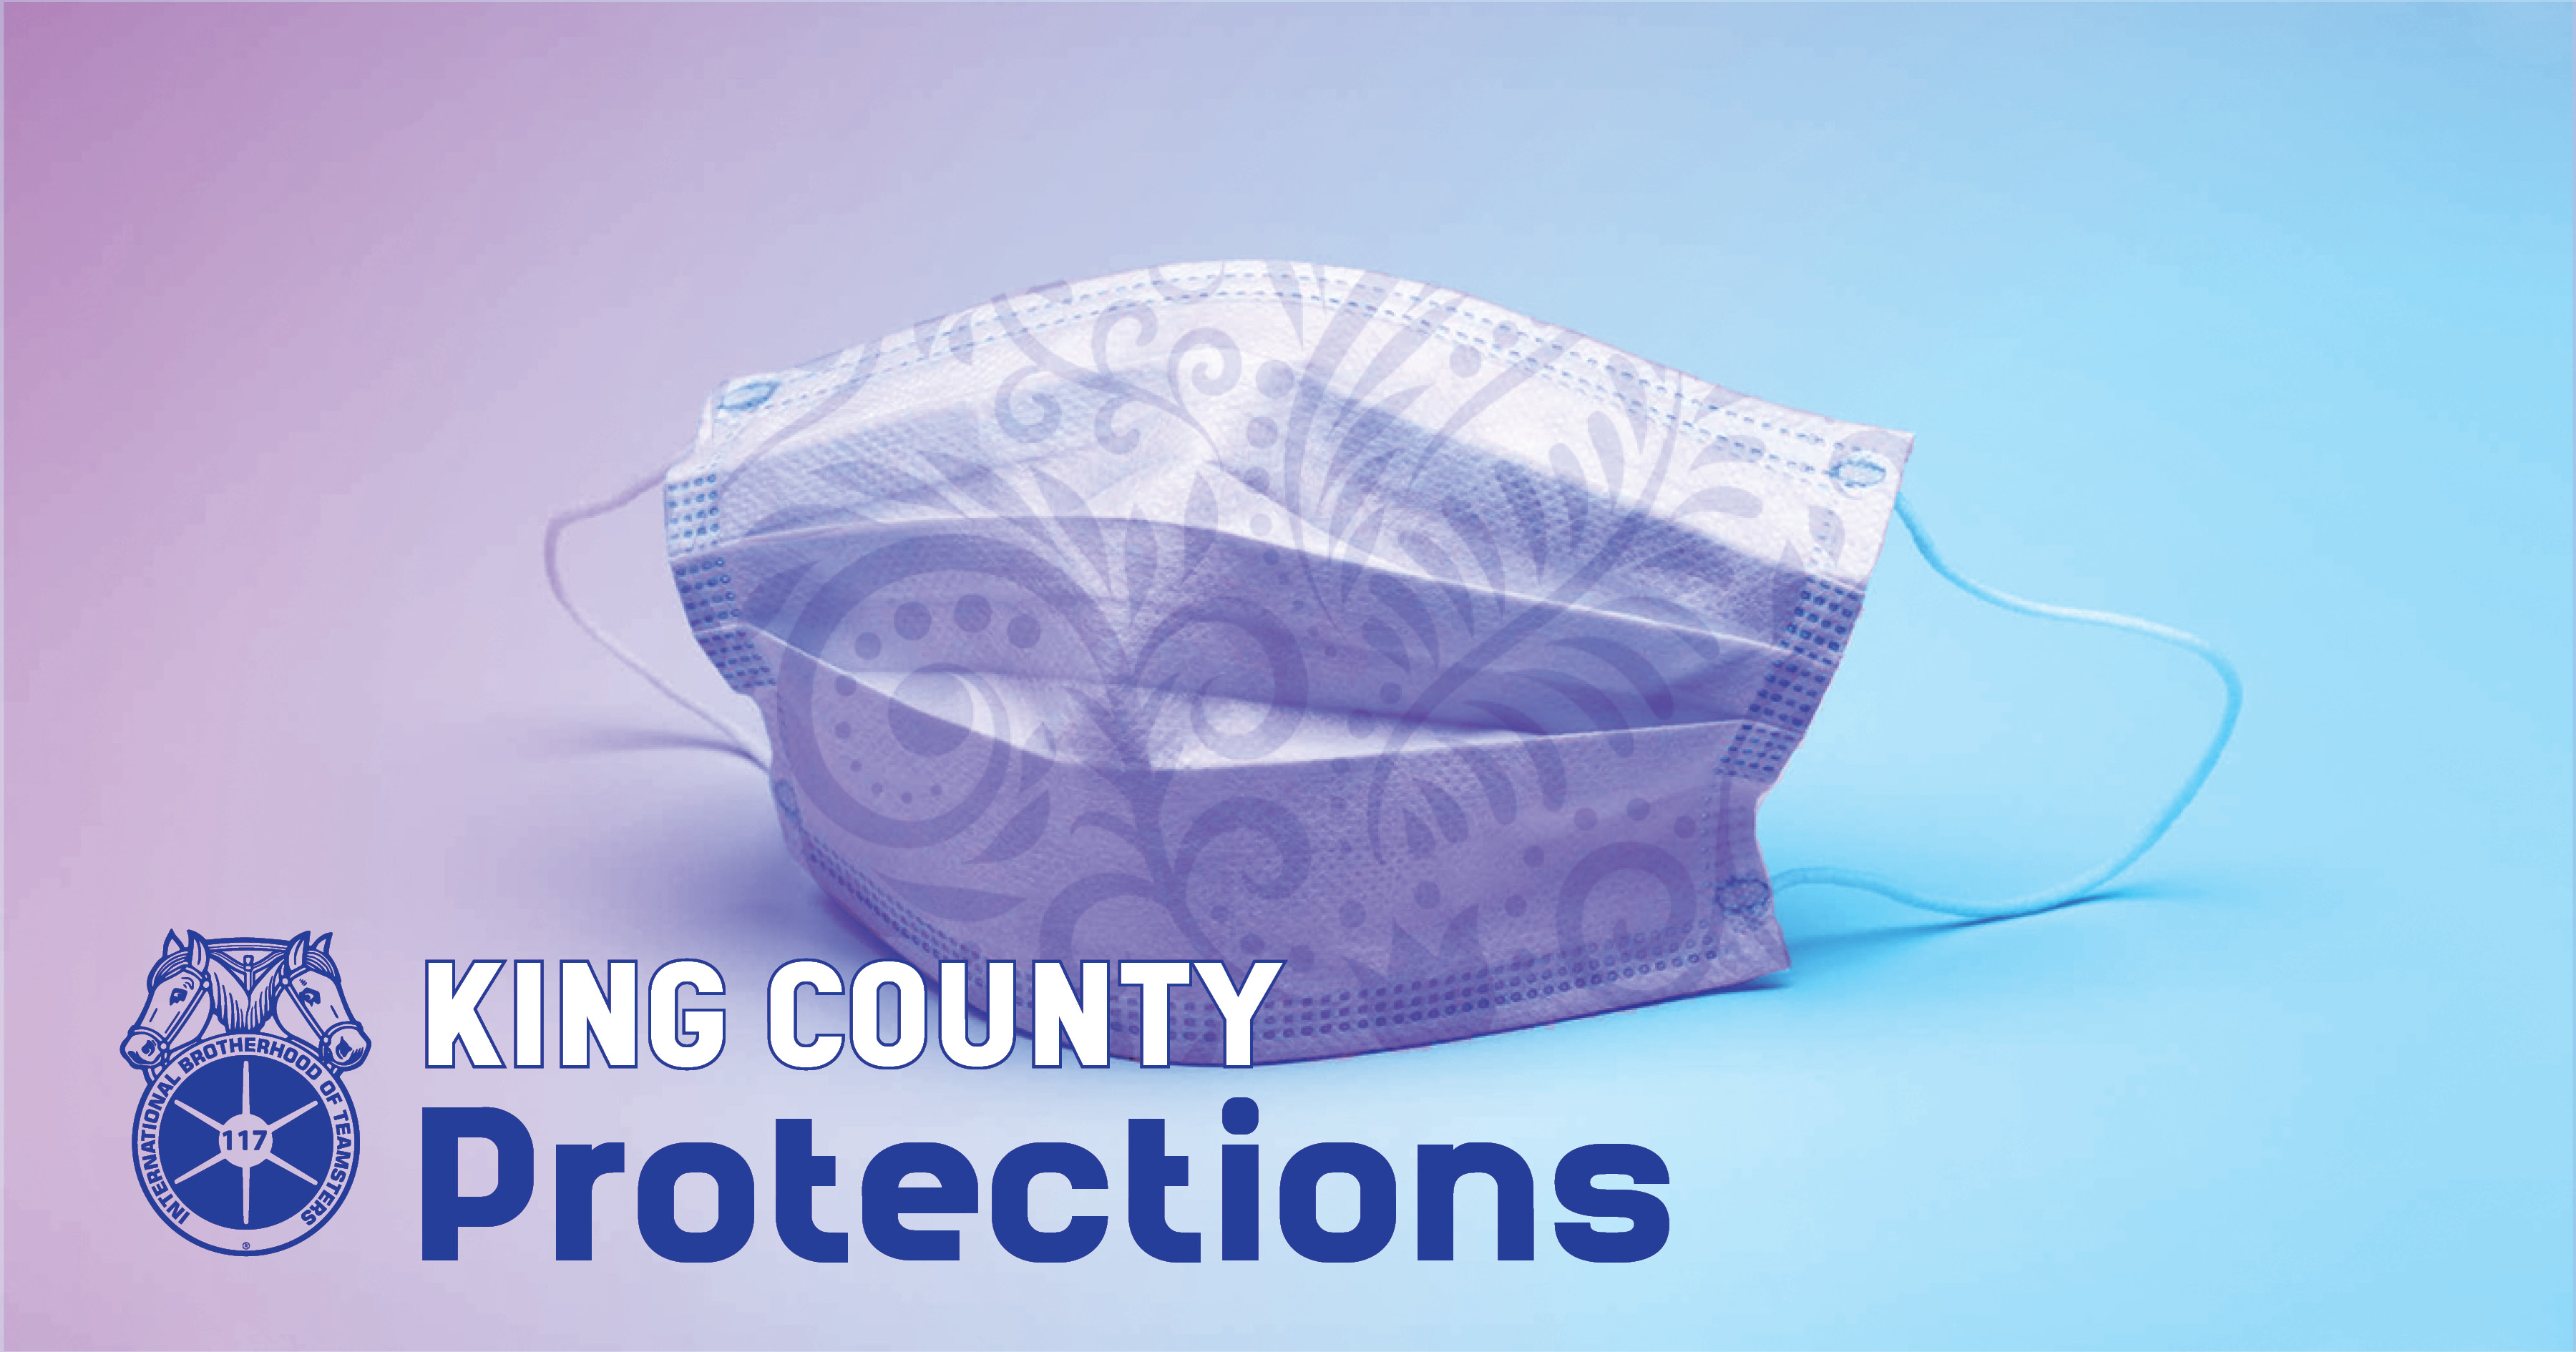 KC_Protections.jpg